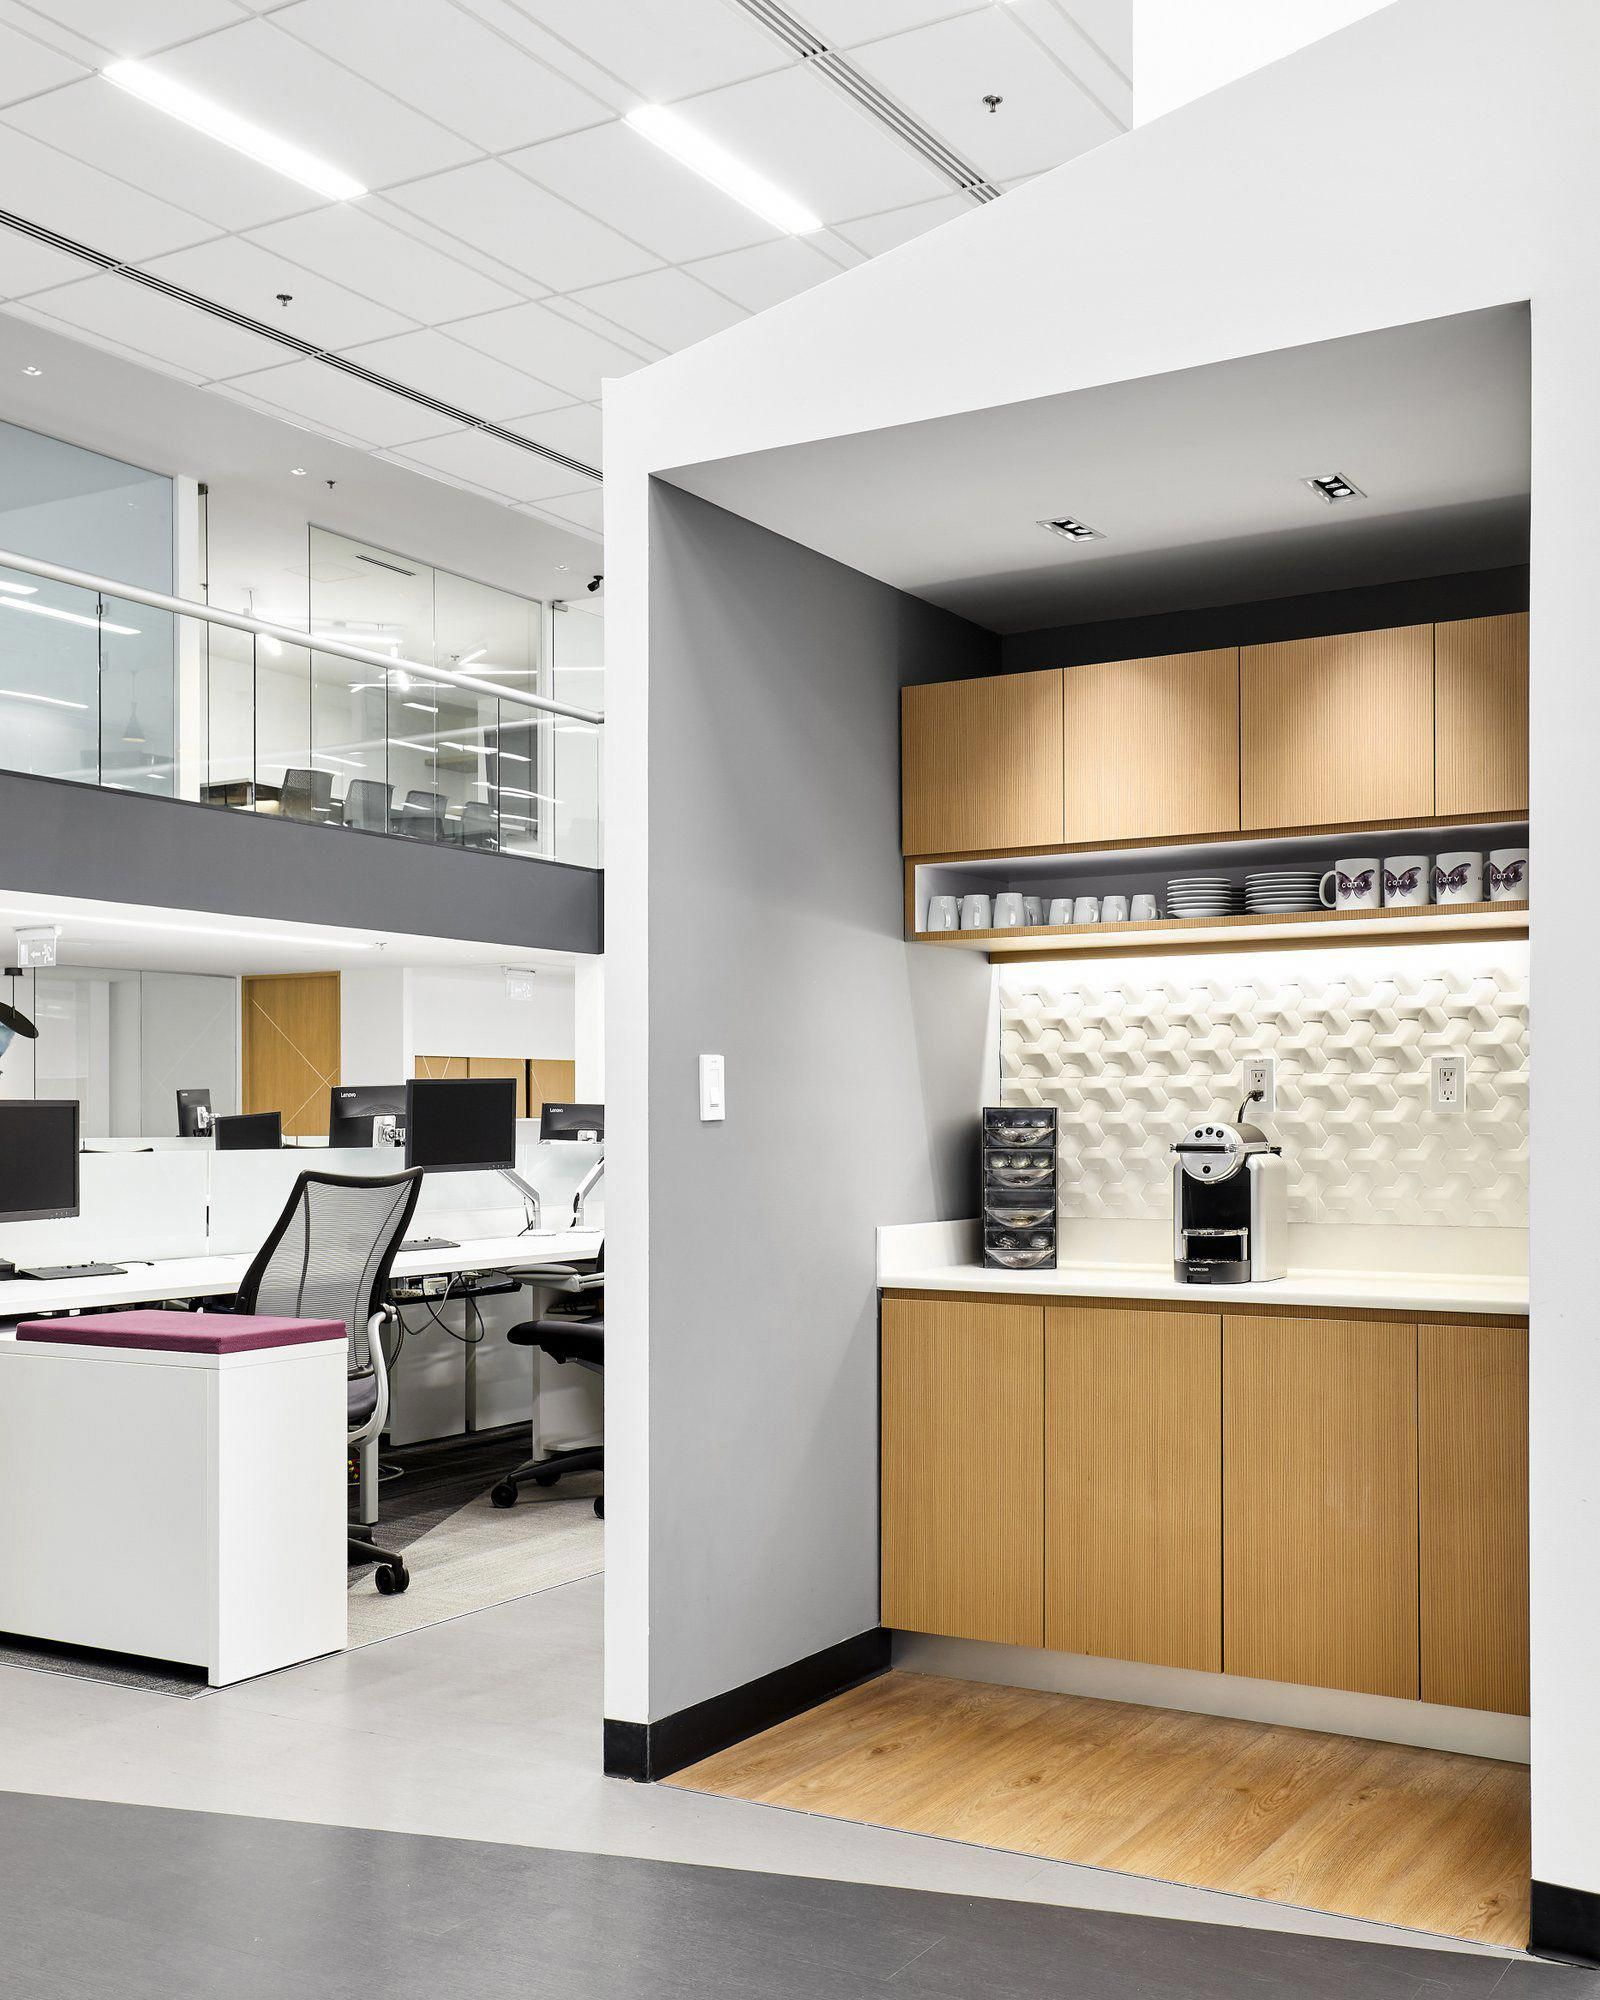 Office Design Ideas For Small Office Home Office Arrangement Cool Home Office Furniture Ideas 20190206 Desain Kantor Desain Desain Interior